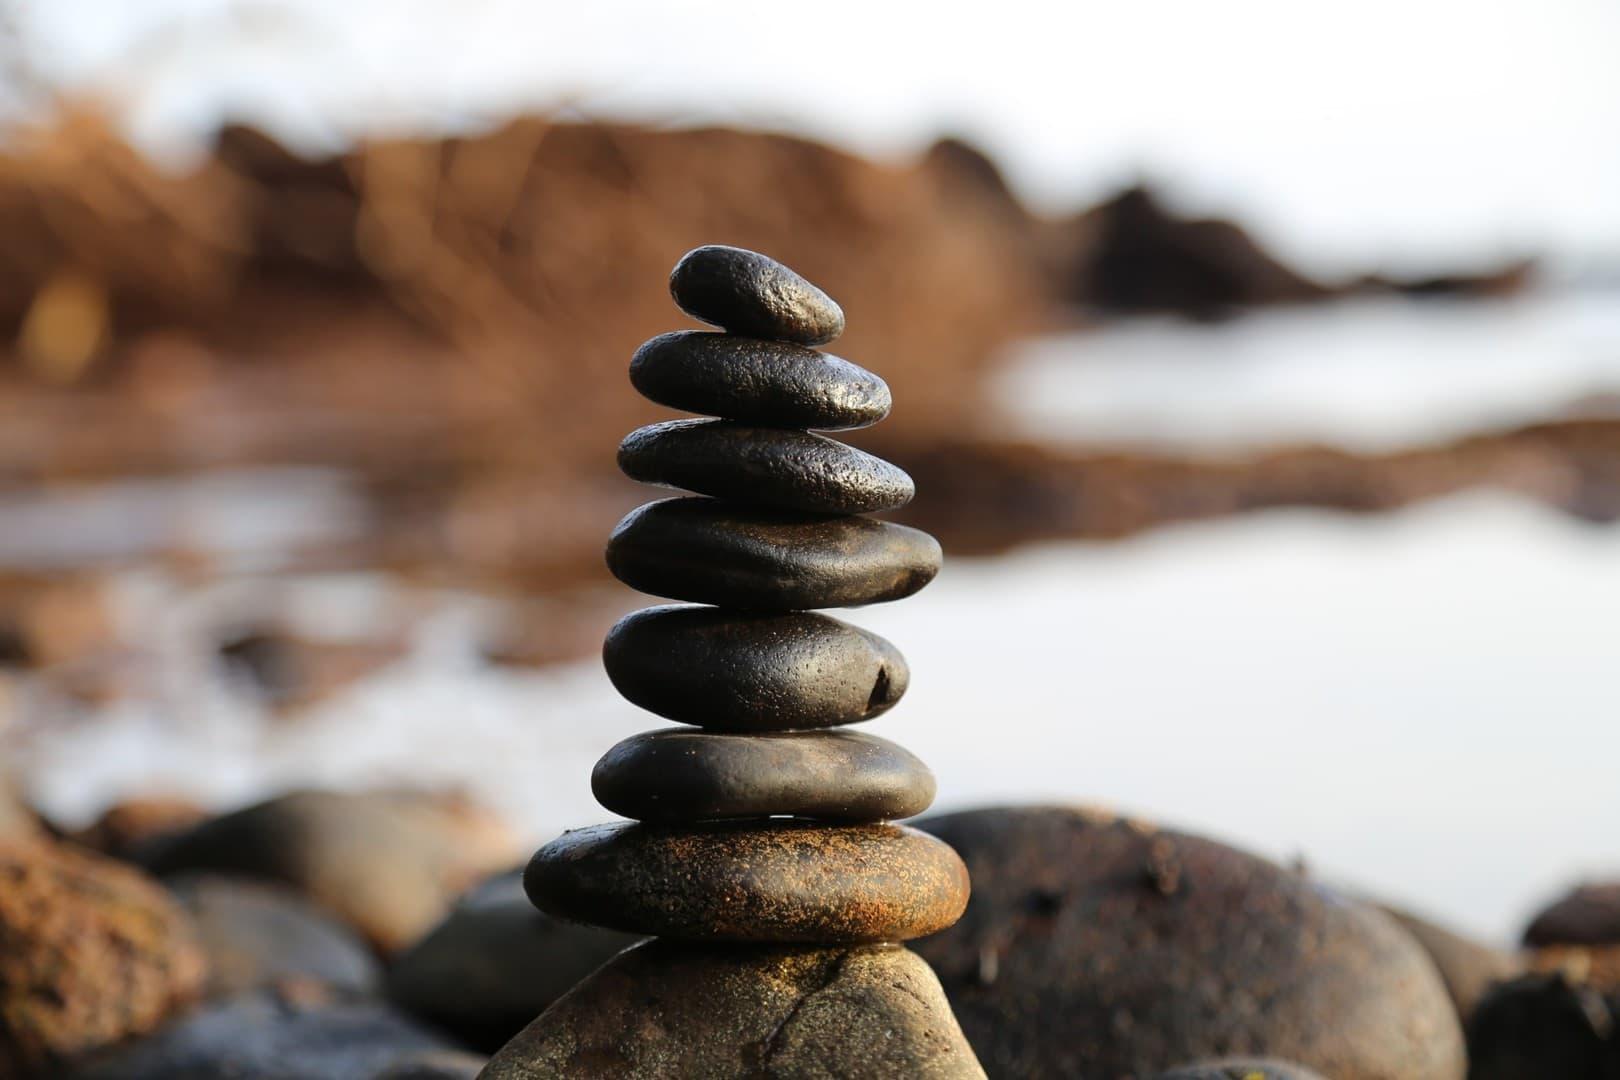 Small rocks balanced on a boulder